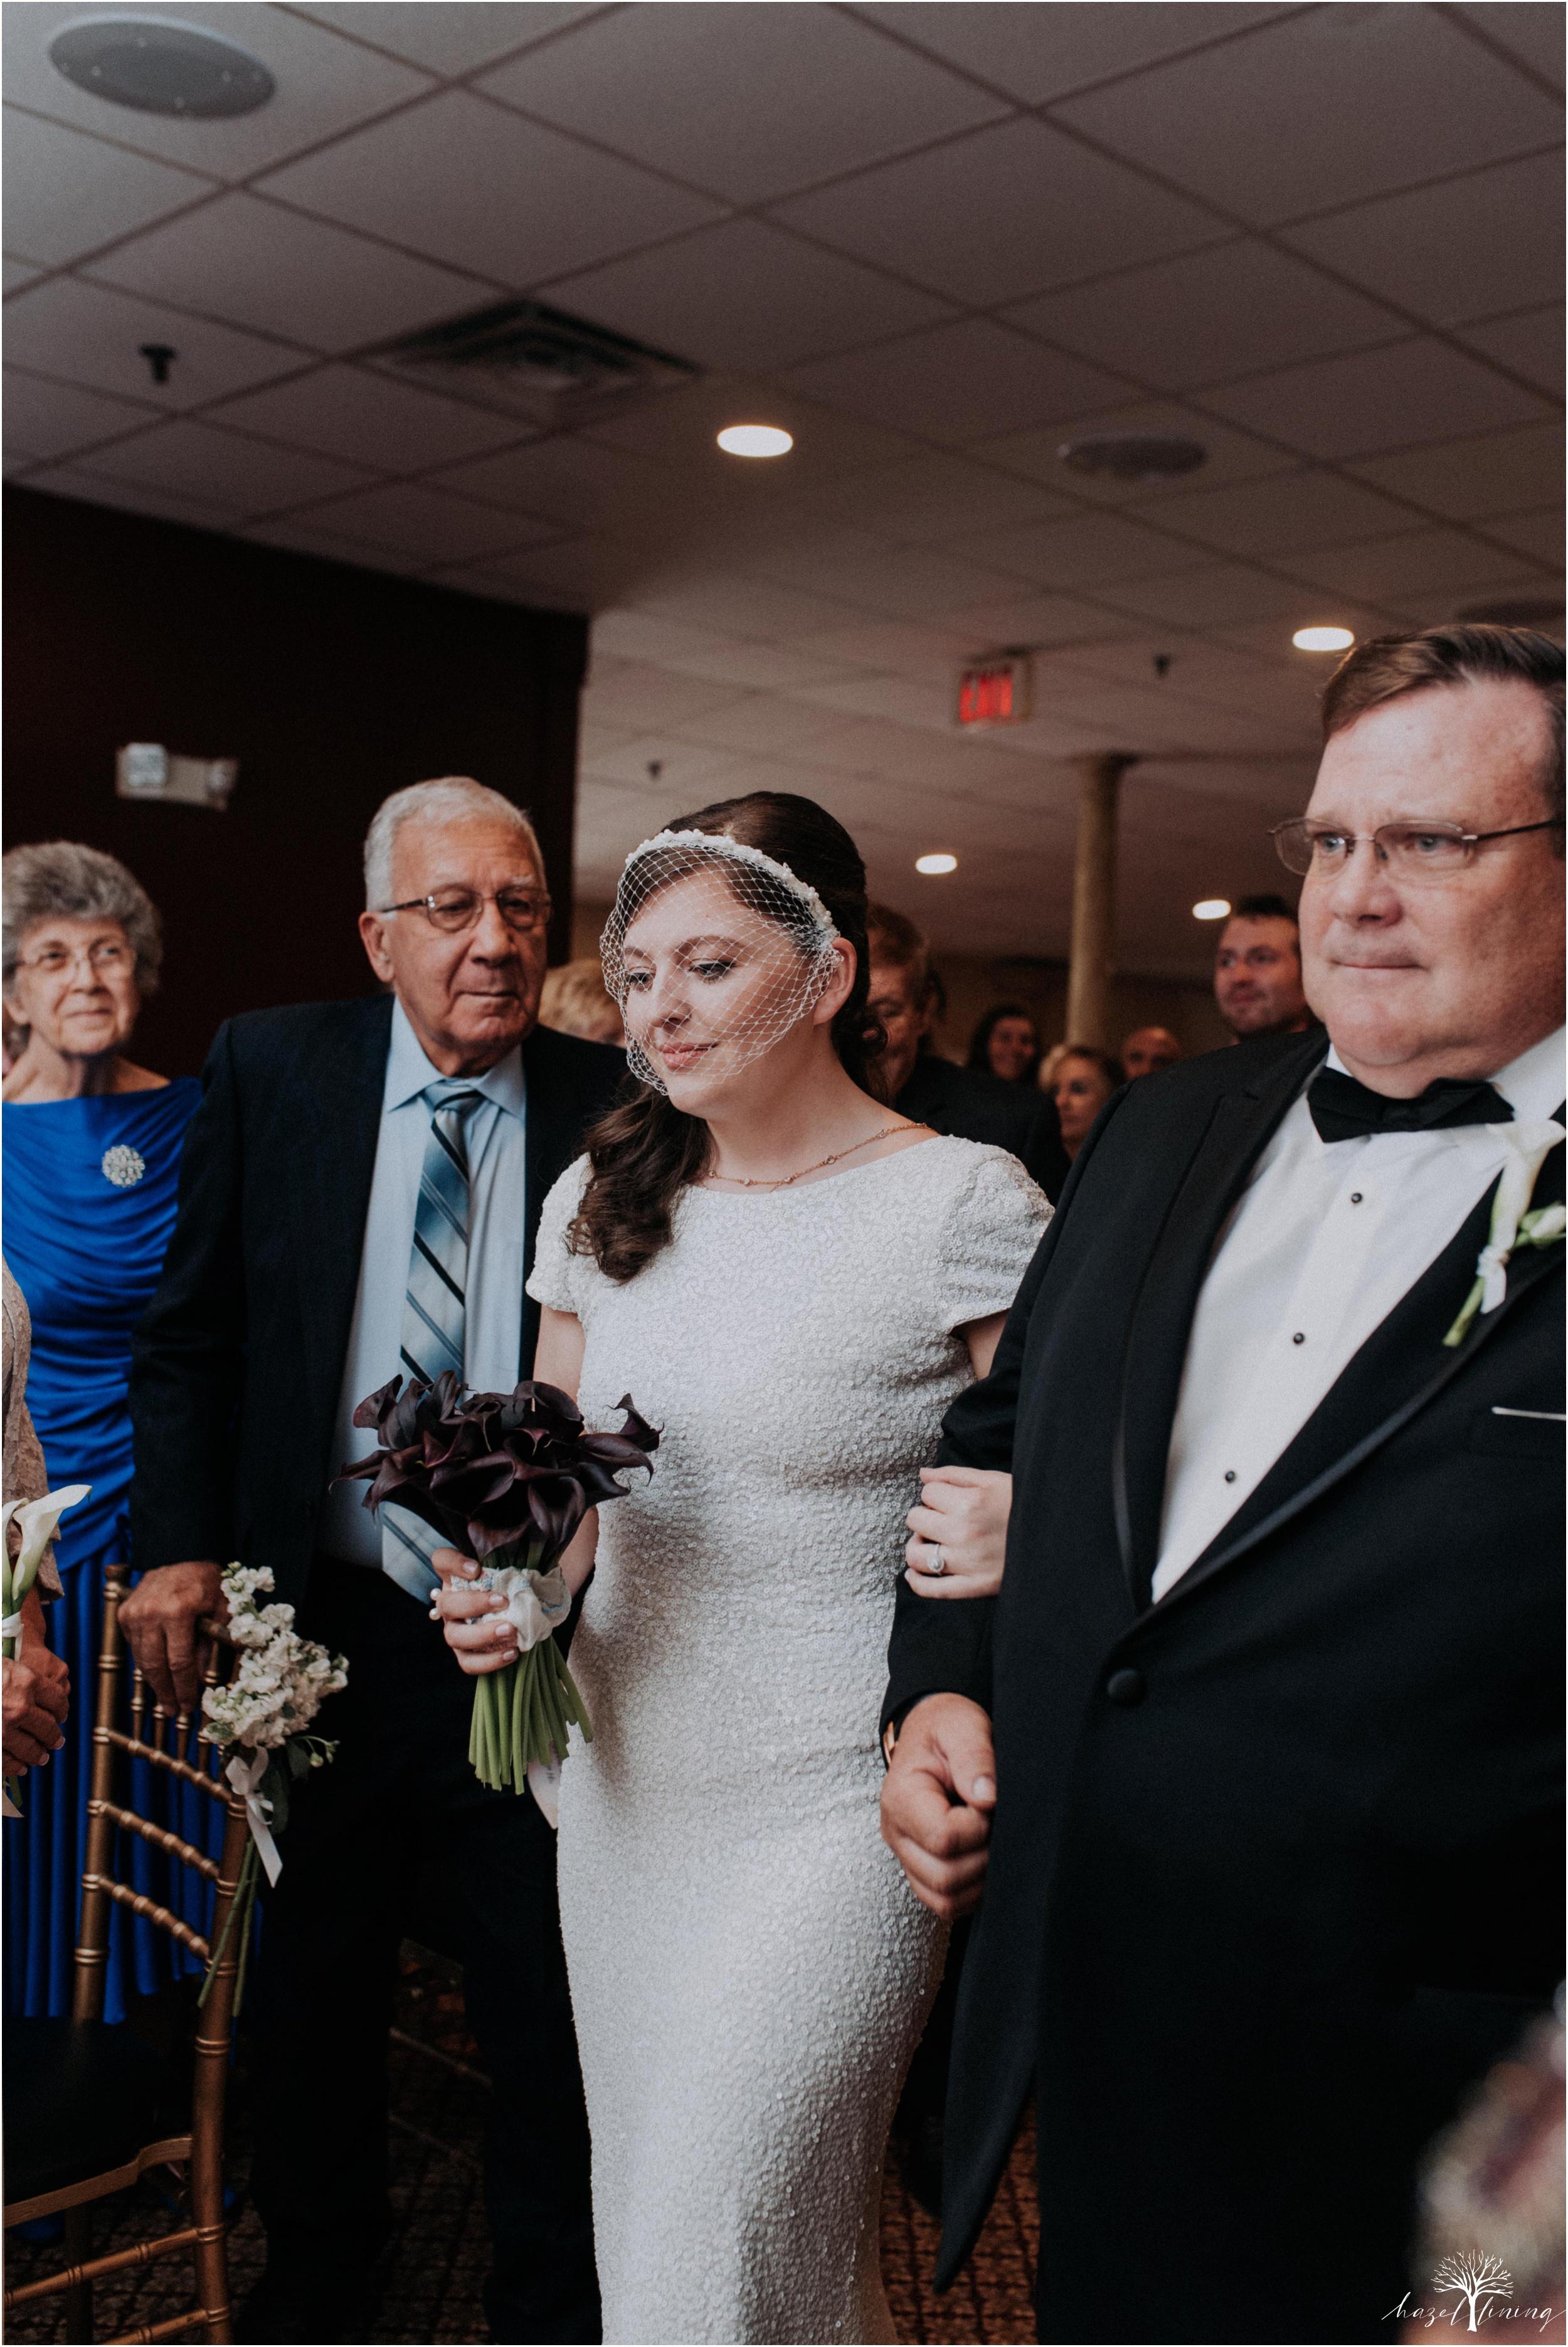 elizabeth-doelp-andrew-foreback-middletown-country-club-summer-langhorne-pennsylvania-wedding-hazel-lining-travel-wedding-elopement-photography_0110.jpg